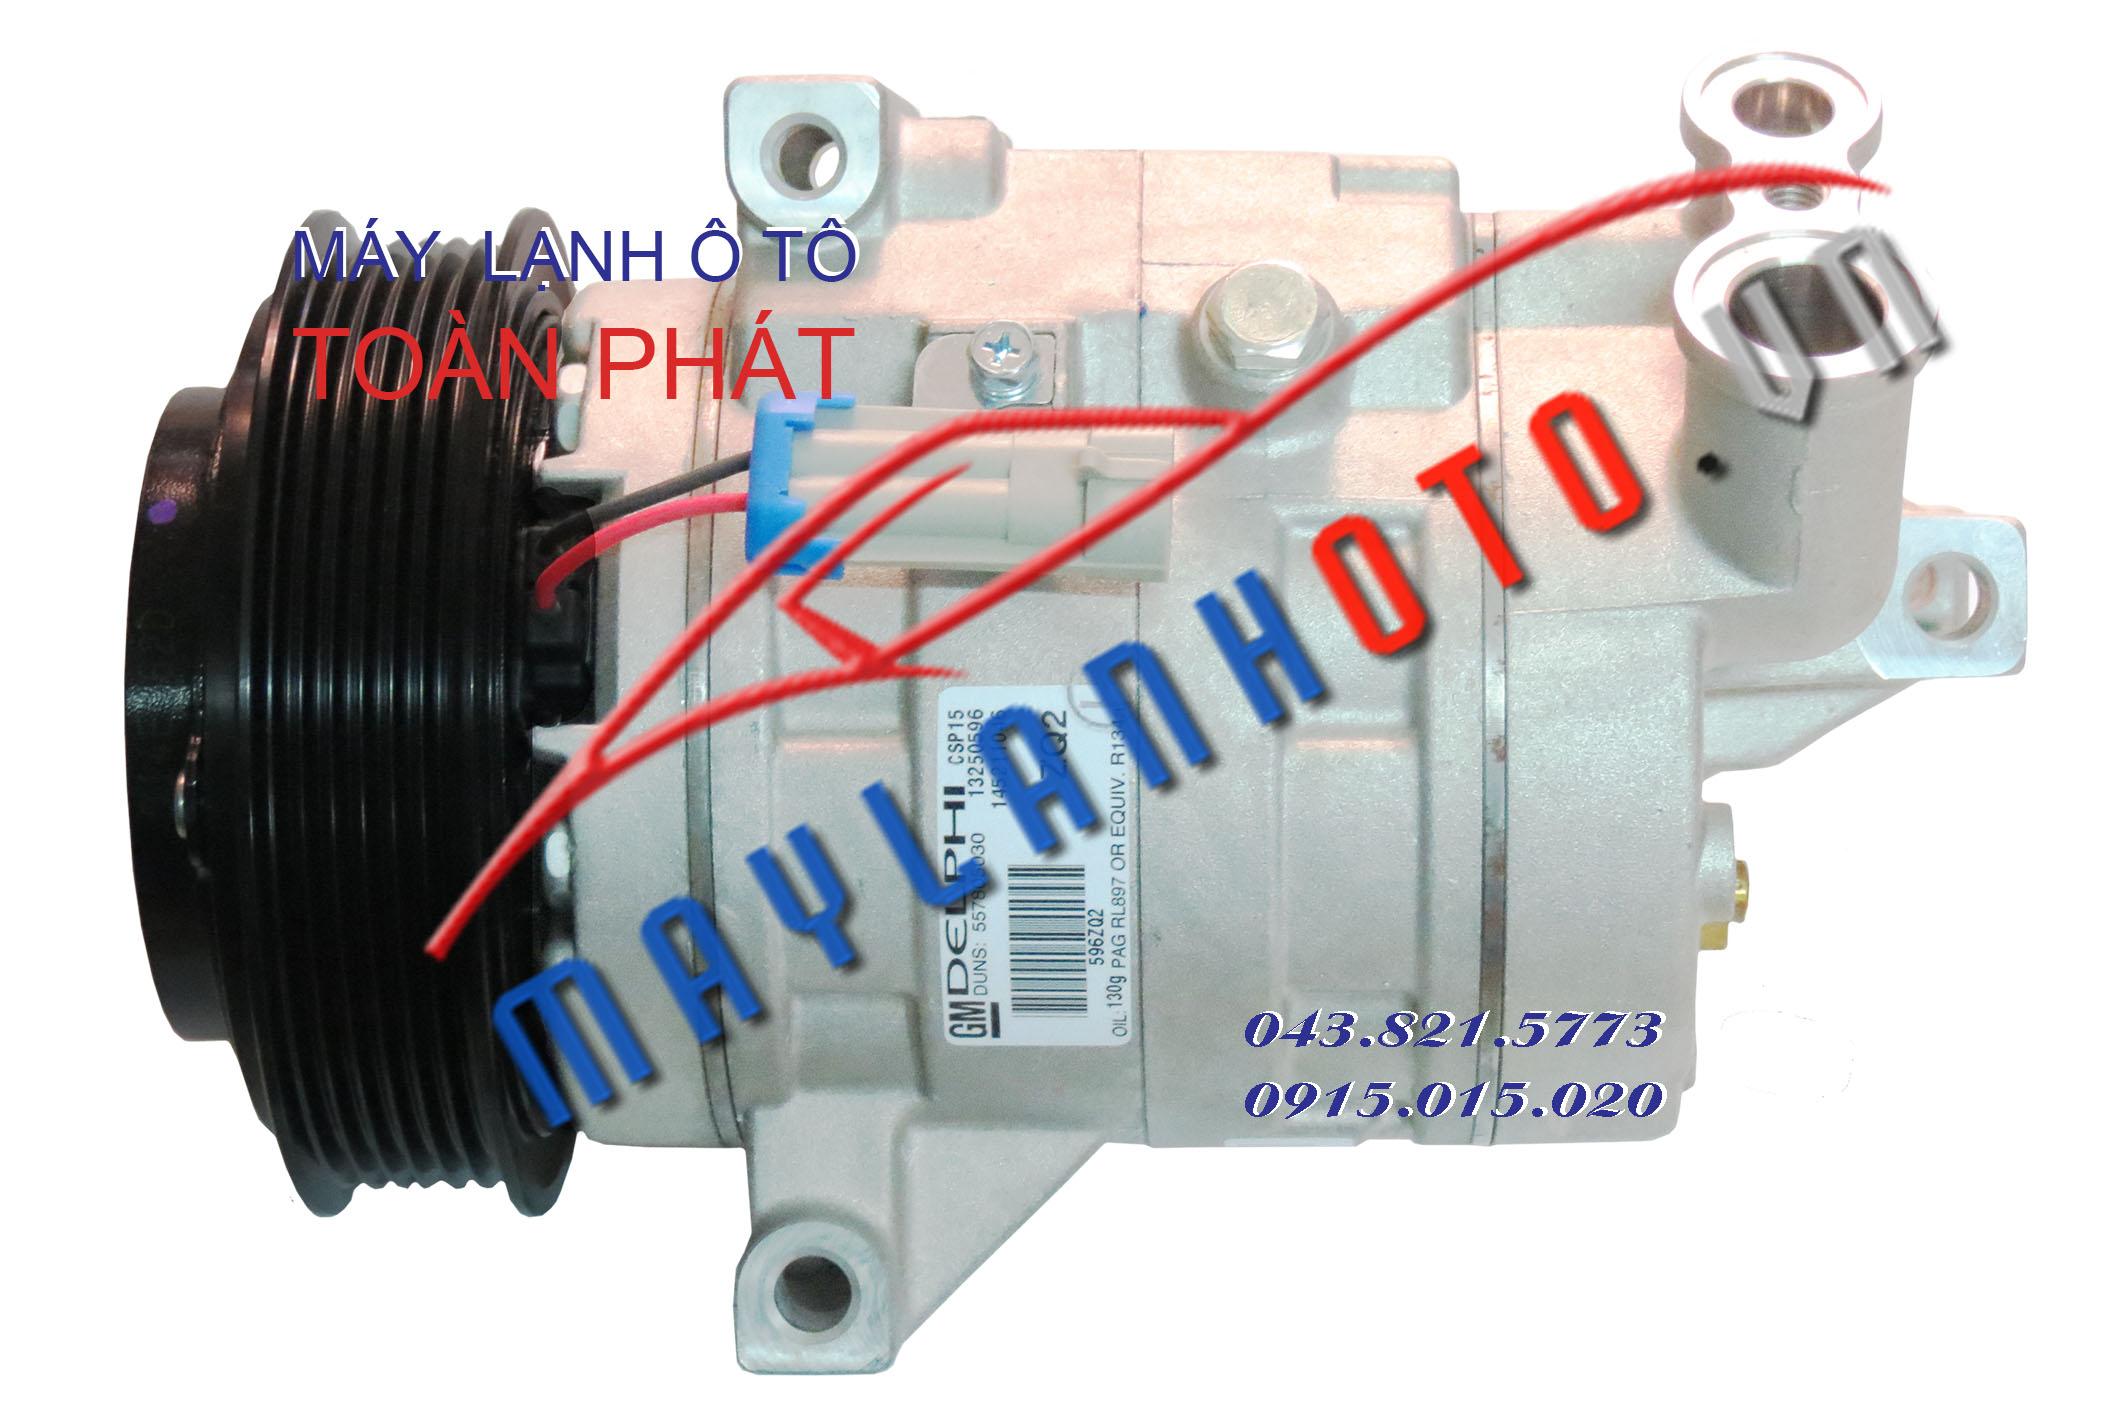 Lacetti CDX - Chevrolet Cruze / Lốc lạnh điều hòa Daewoo Lacetti CDX - Chevrolet Cruze / Máy nén khí điều hòa Daewoo Lacetti CDX - Chevrolet Cruze